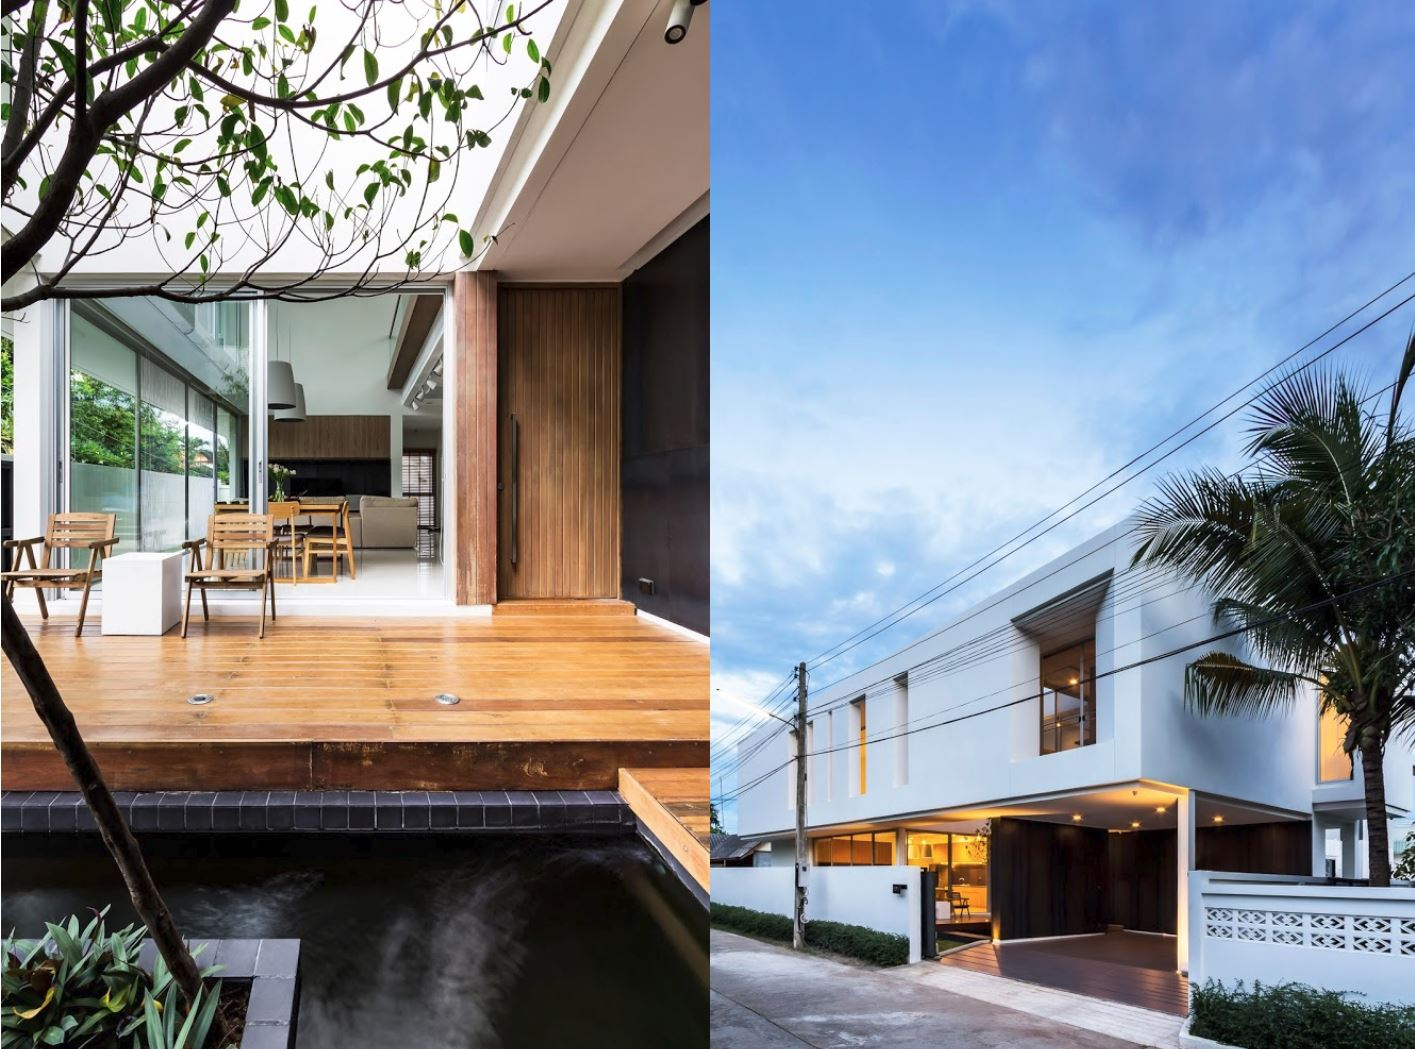 plano de casa moderna con frente curvo | planos de casas modernas